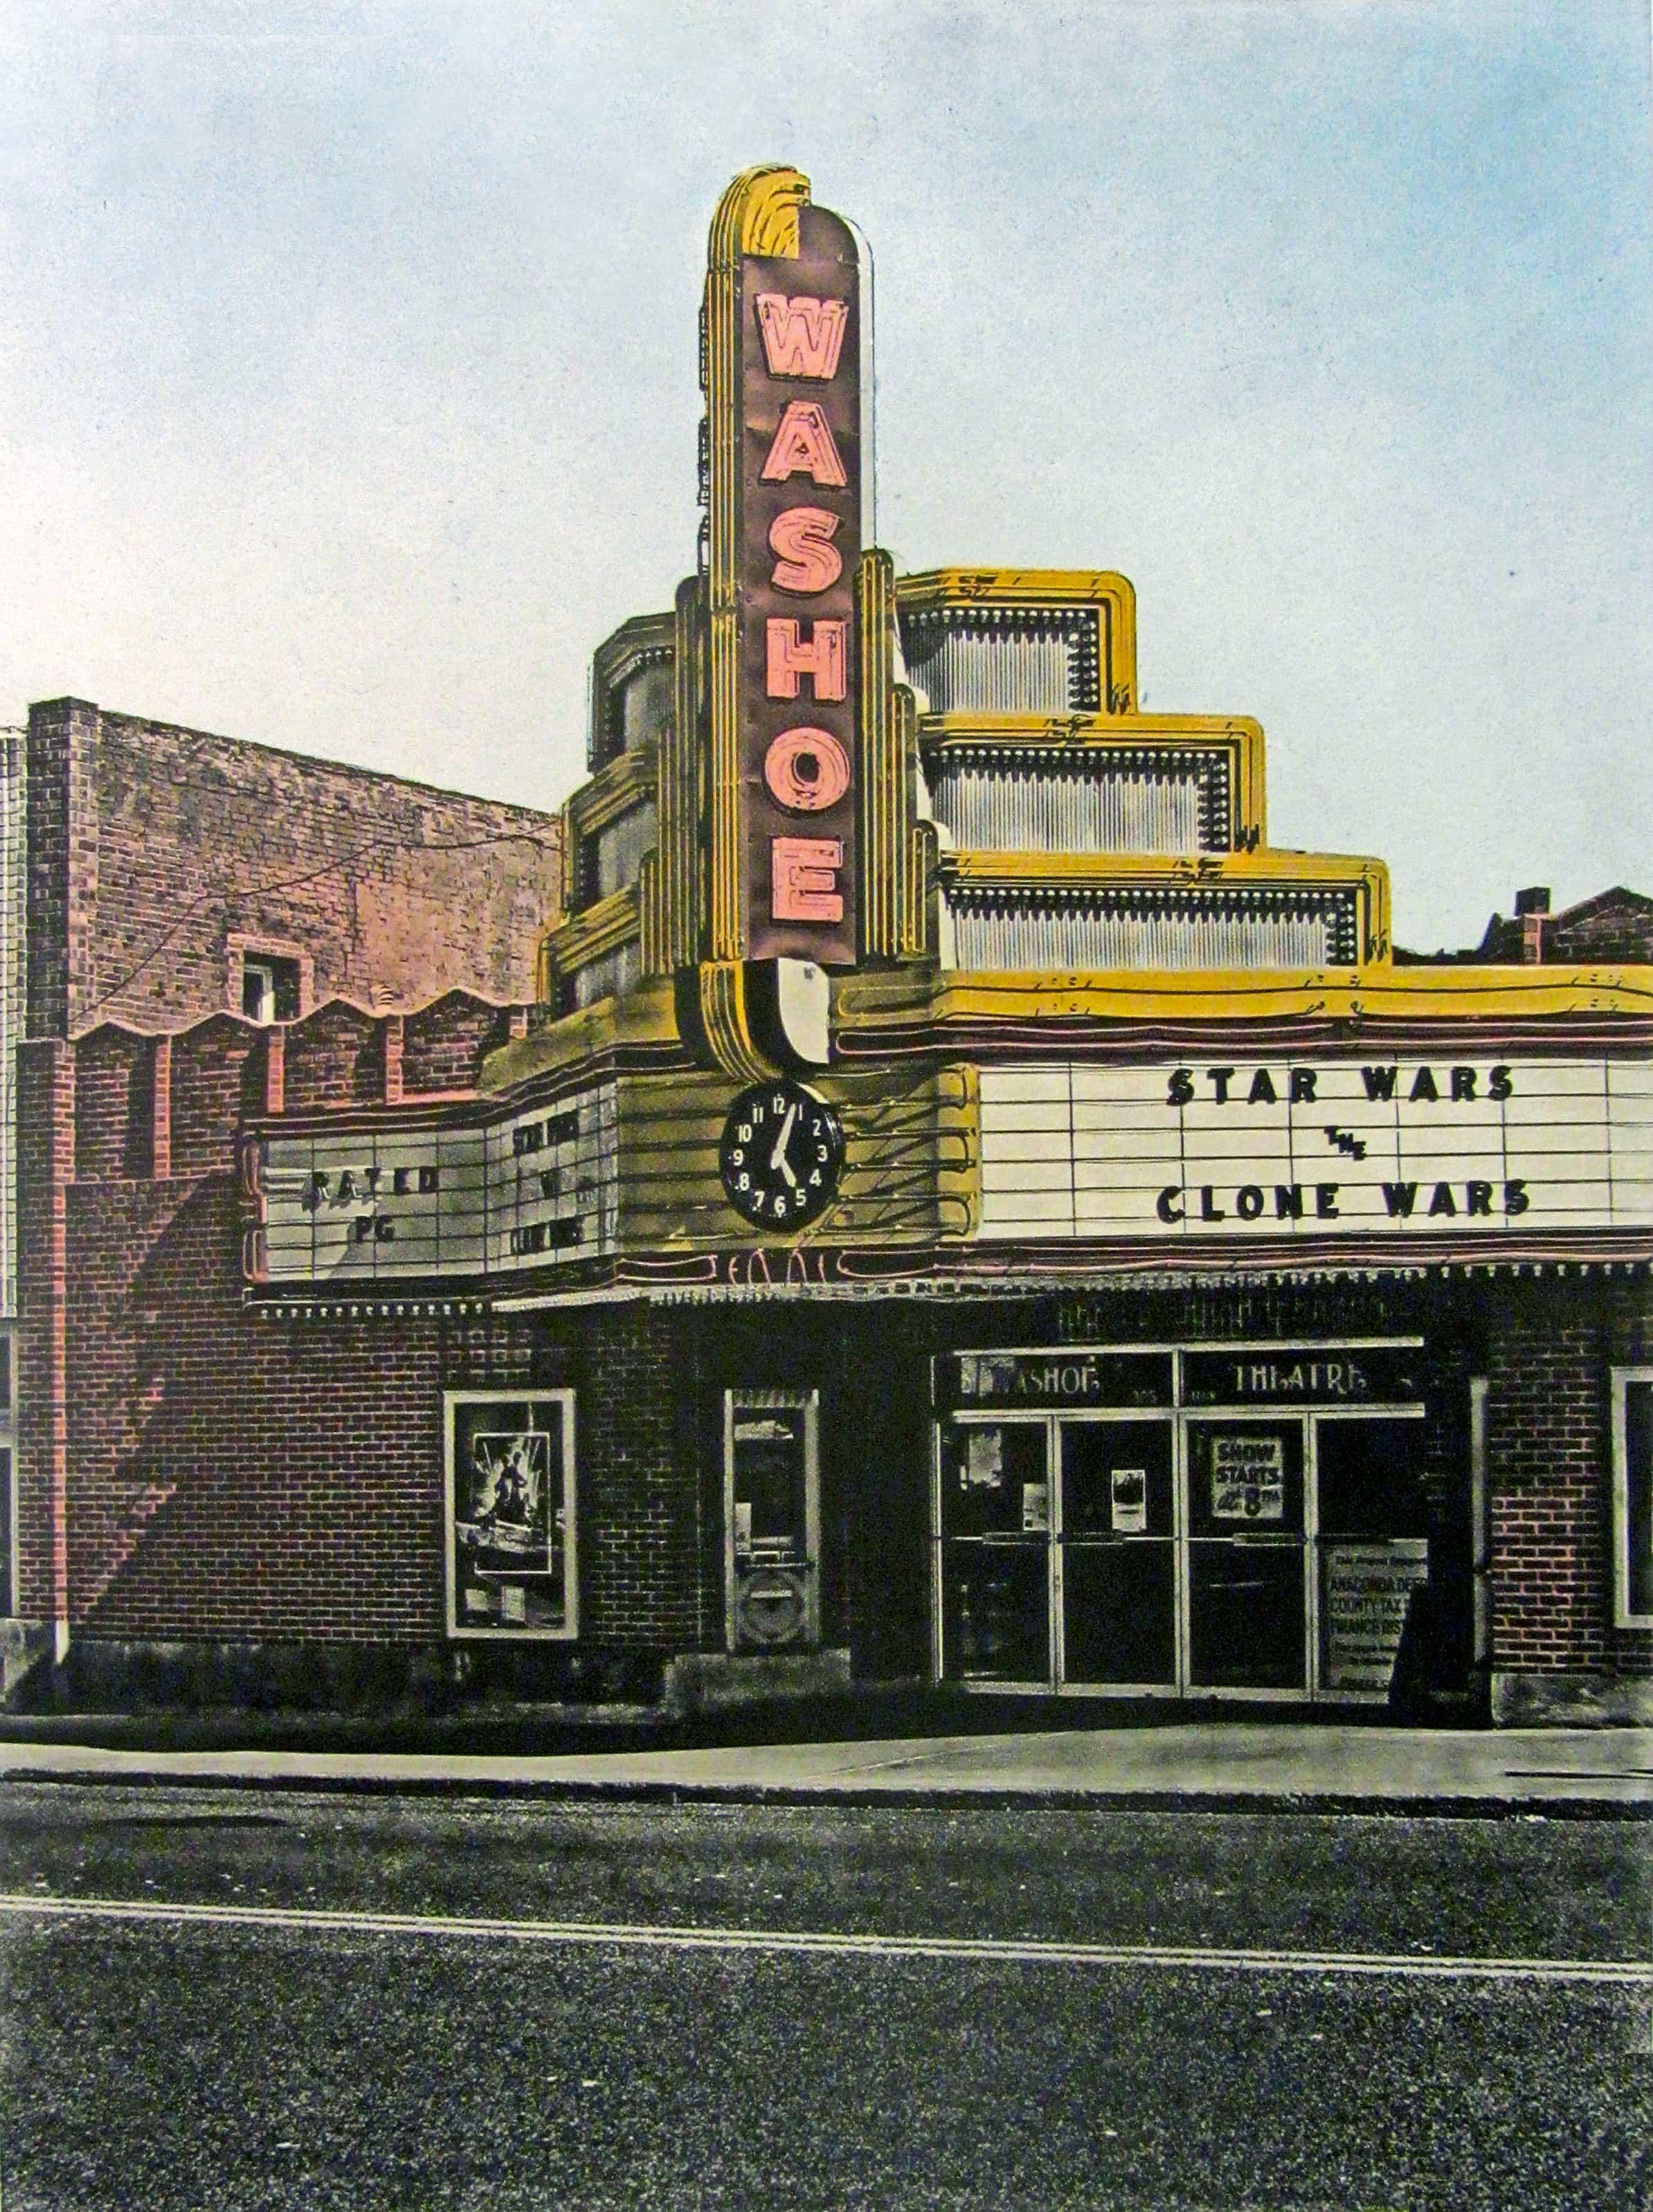 Washoe Theatre